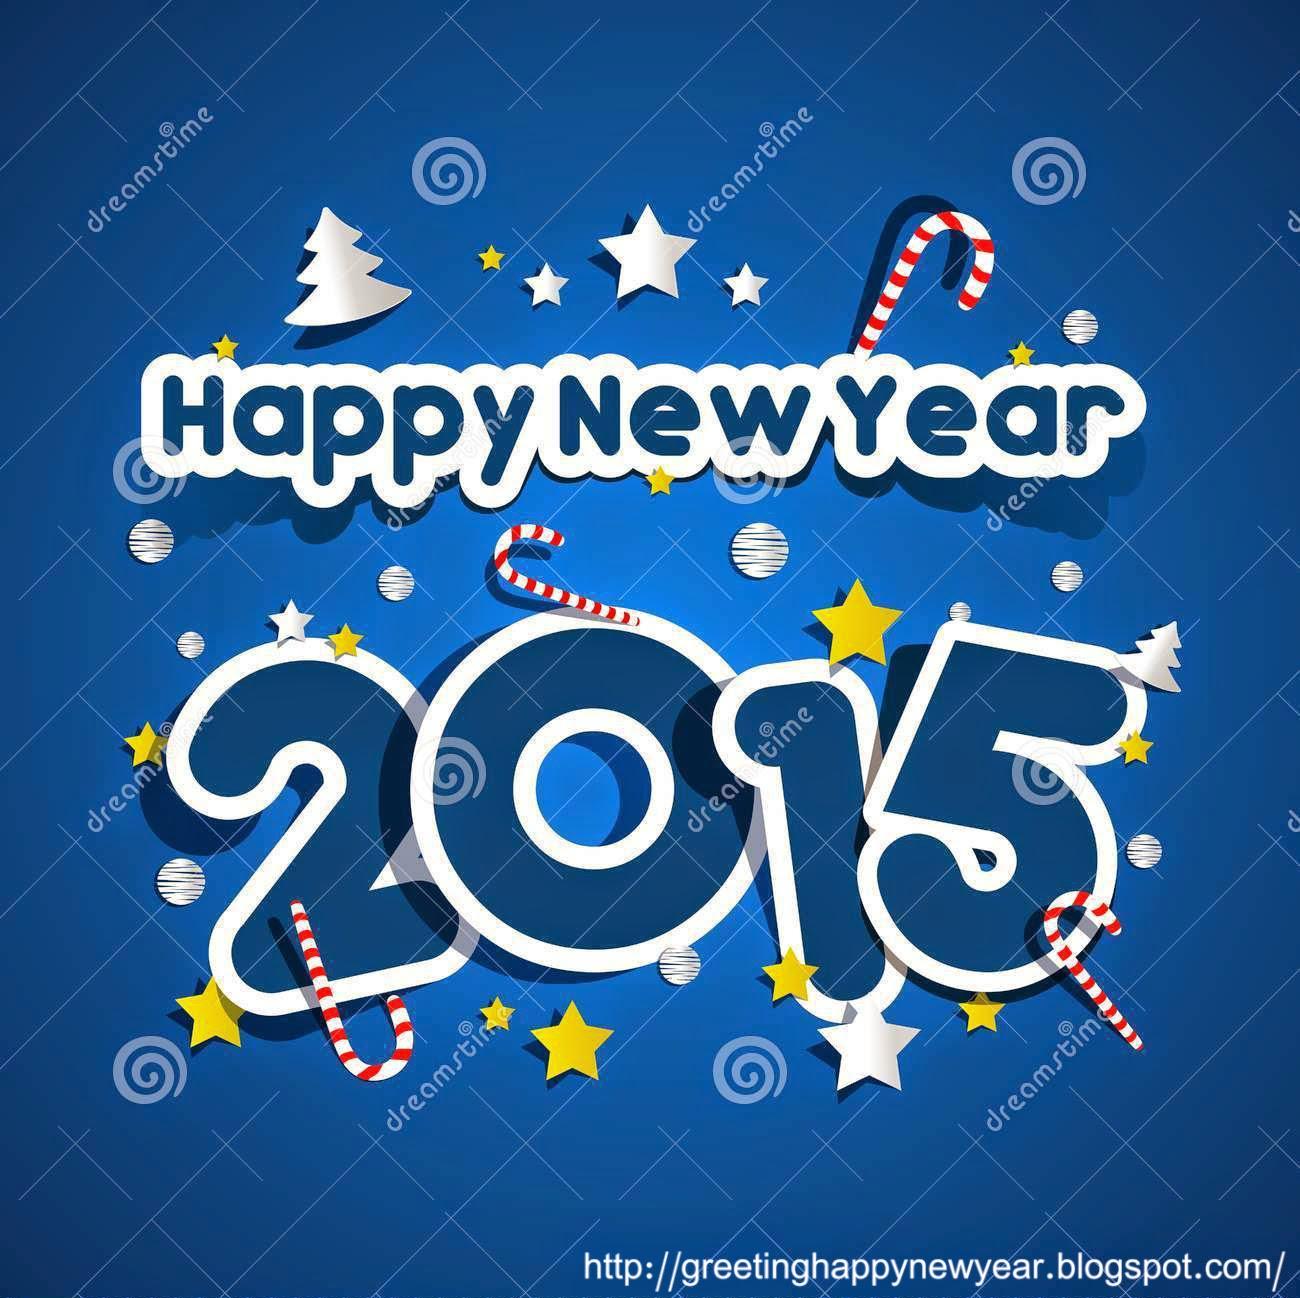 Greeting Happy New Year Photos 2015